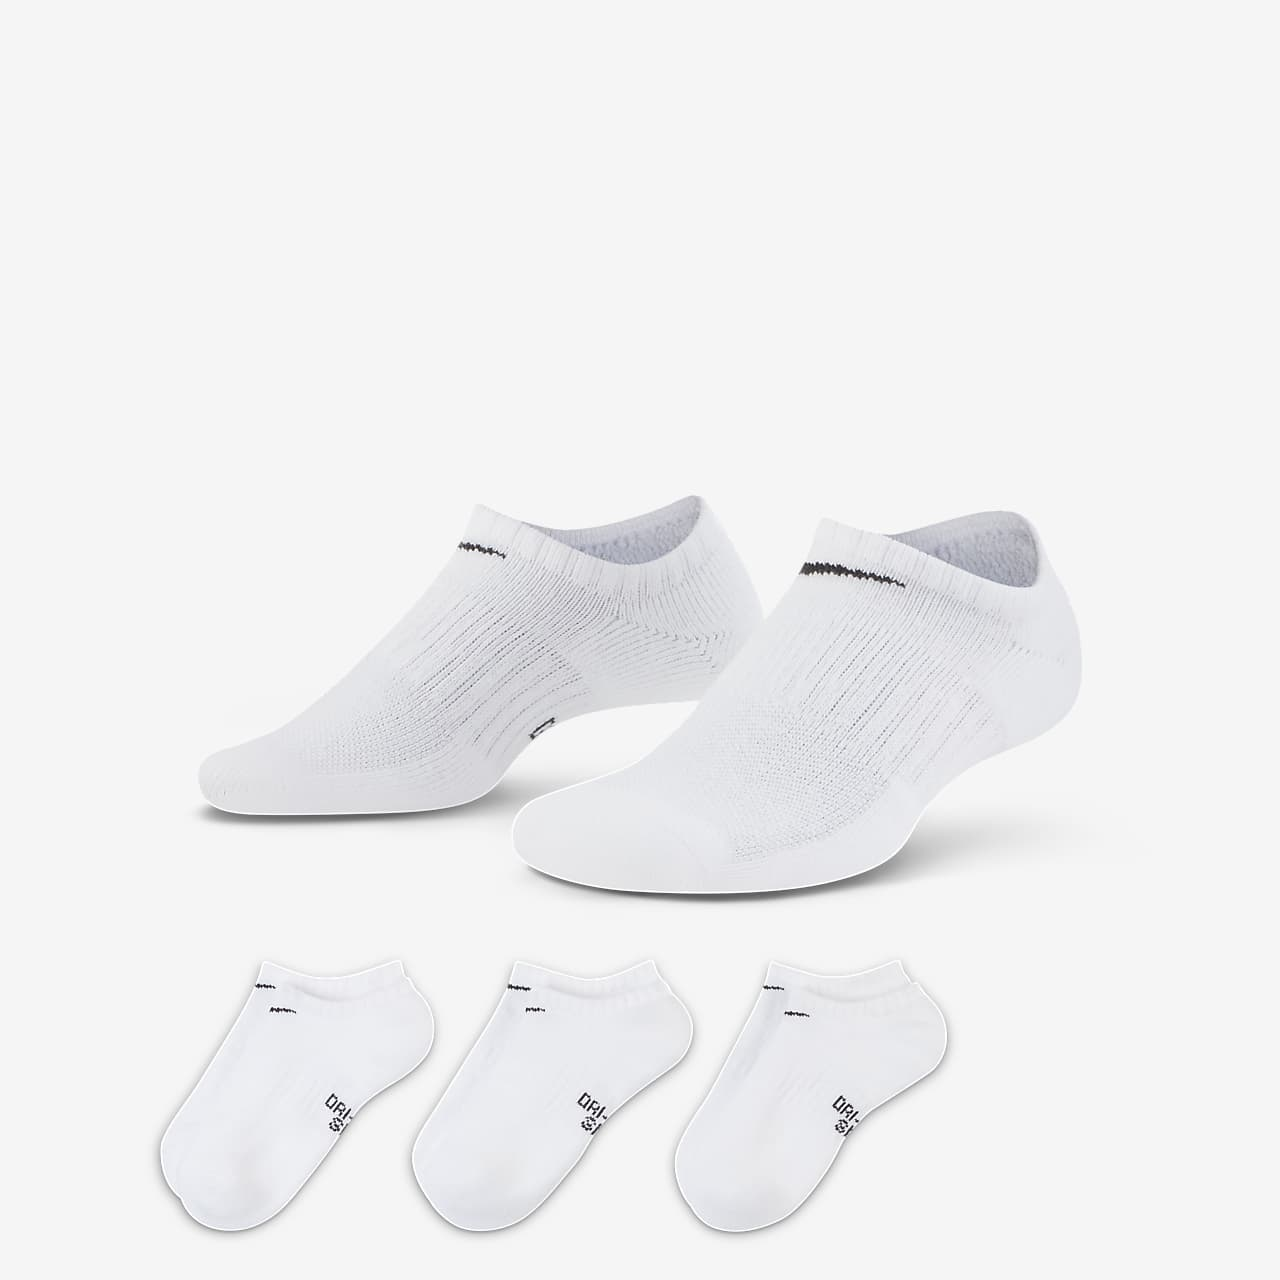 Nike Performance Cushioned No-Show Kindersocken (3 Paar)